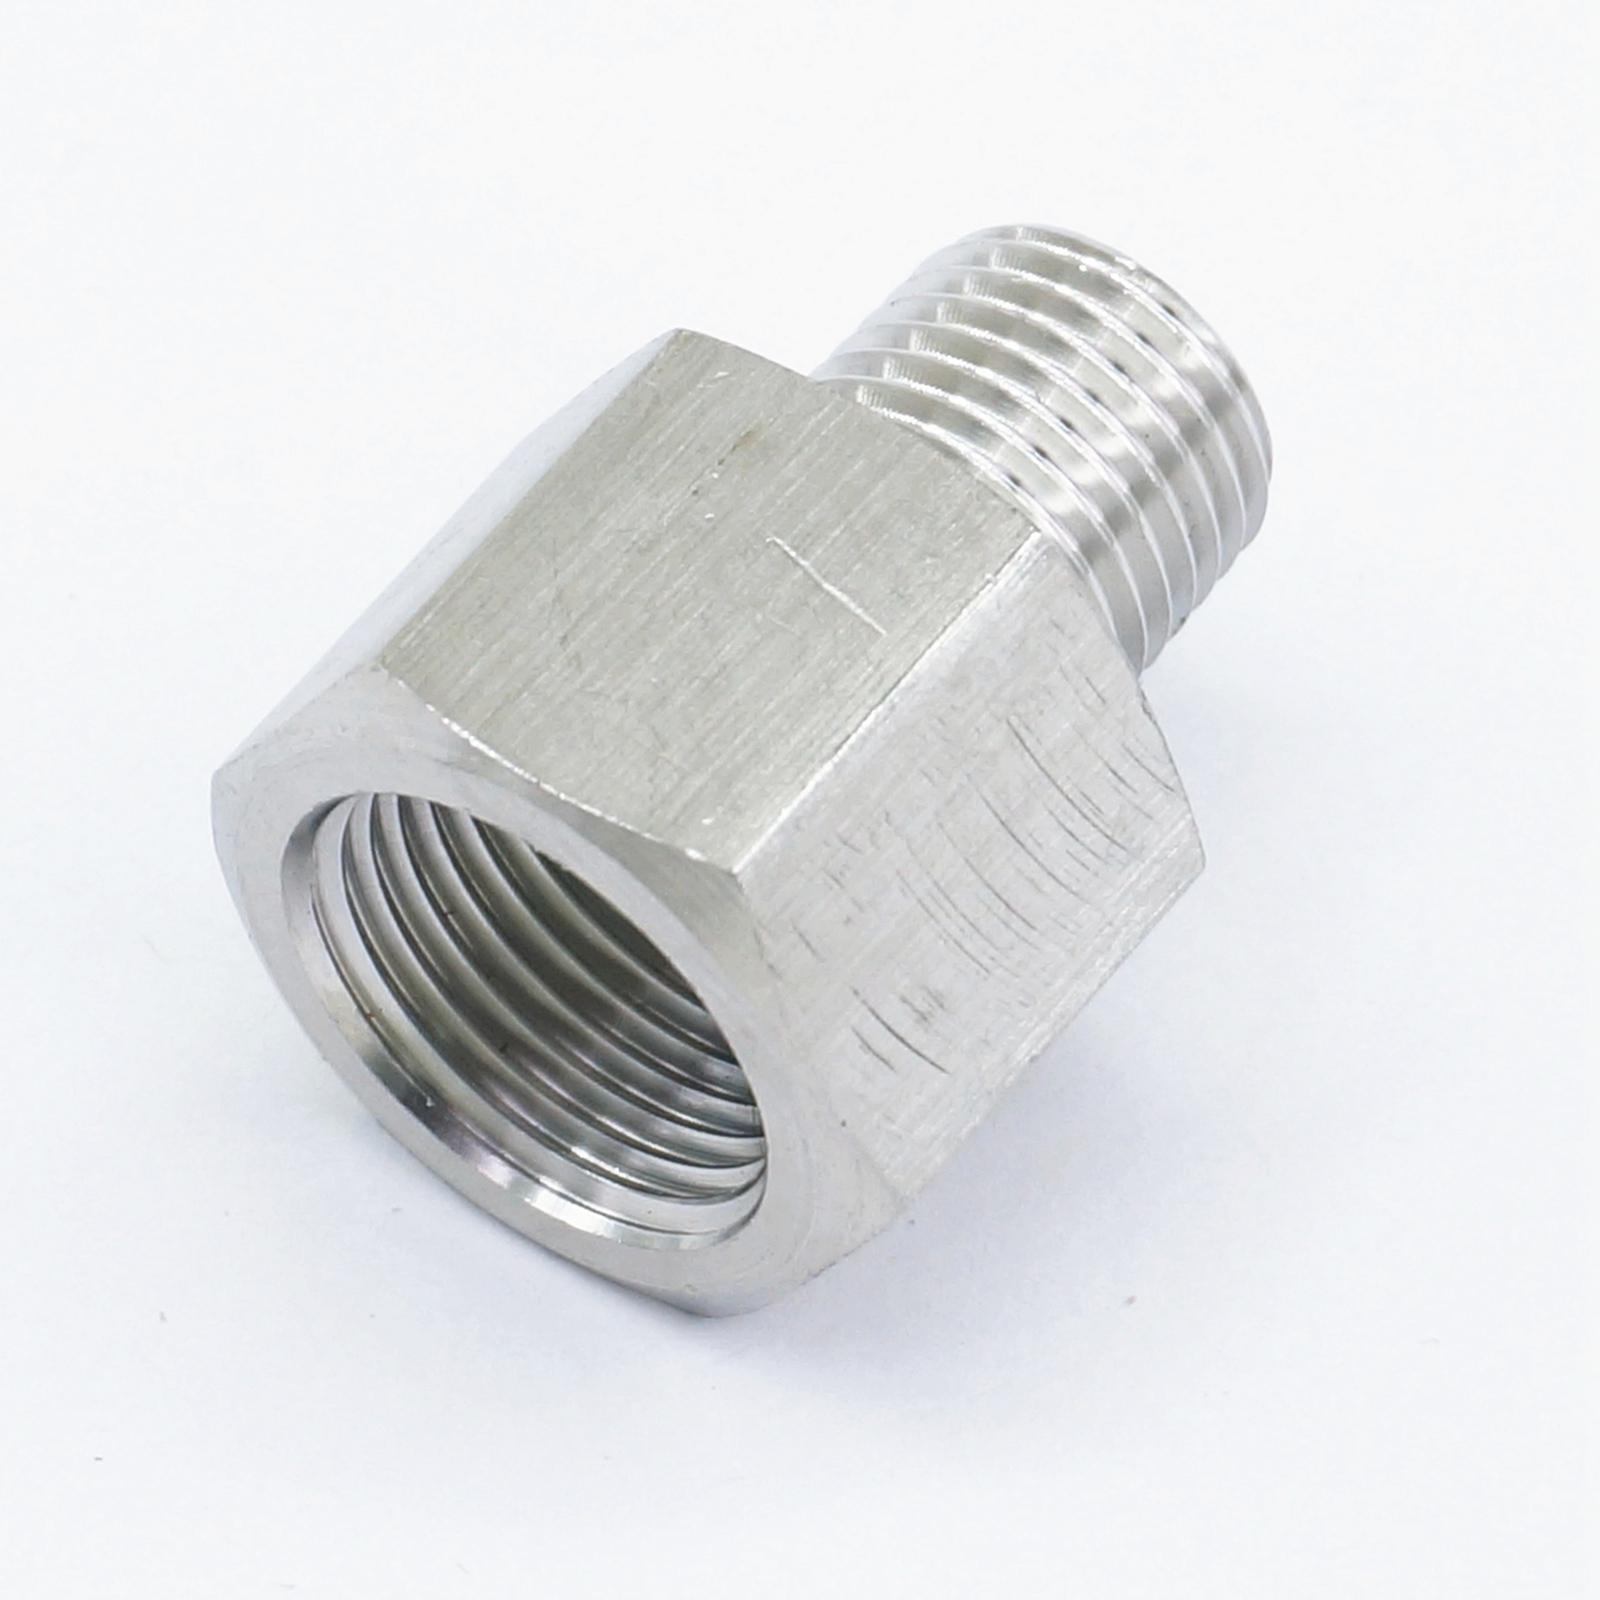 "Conector de instalación de tuberías de acero inoxidable 304, adaptador de 3/8 ""BSP hembra a 1/4"", rosca macho BSP Max presión 2,5 Mpa"